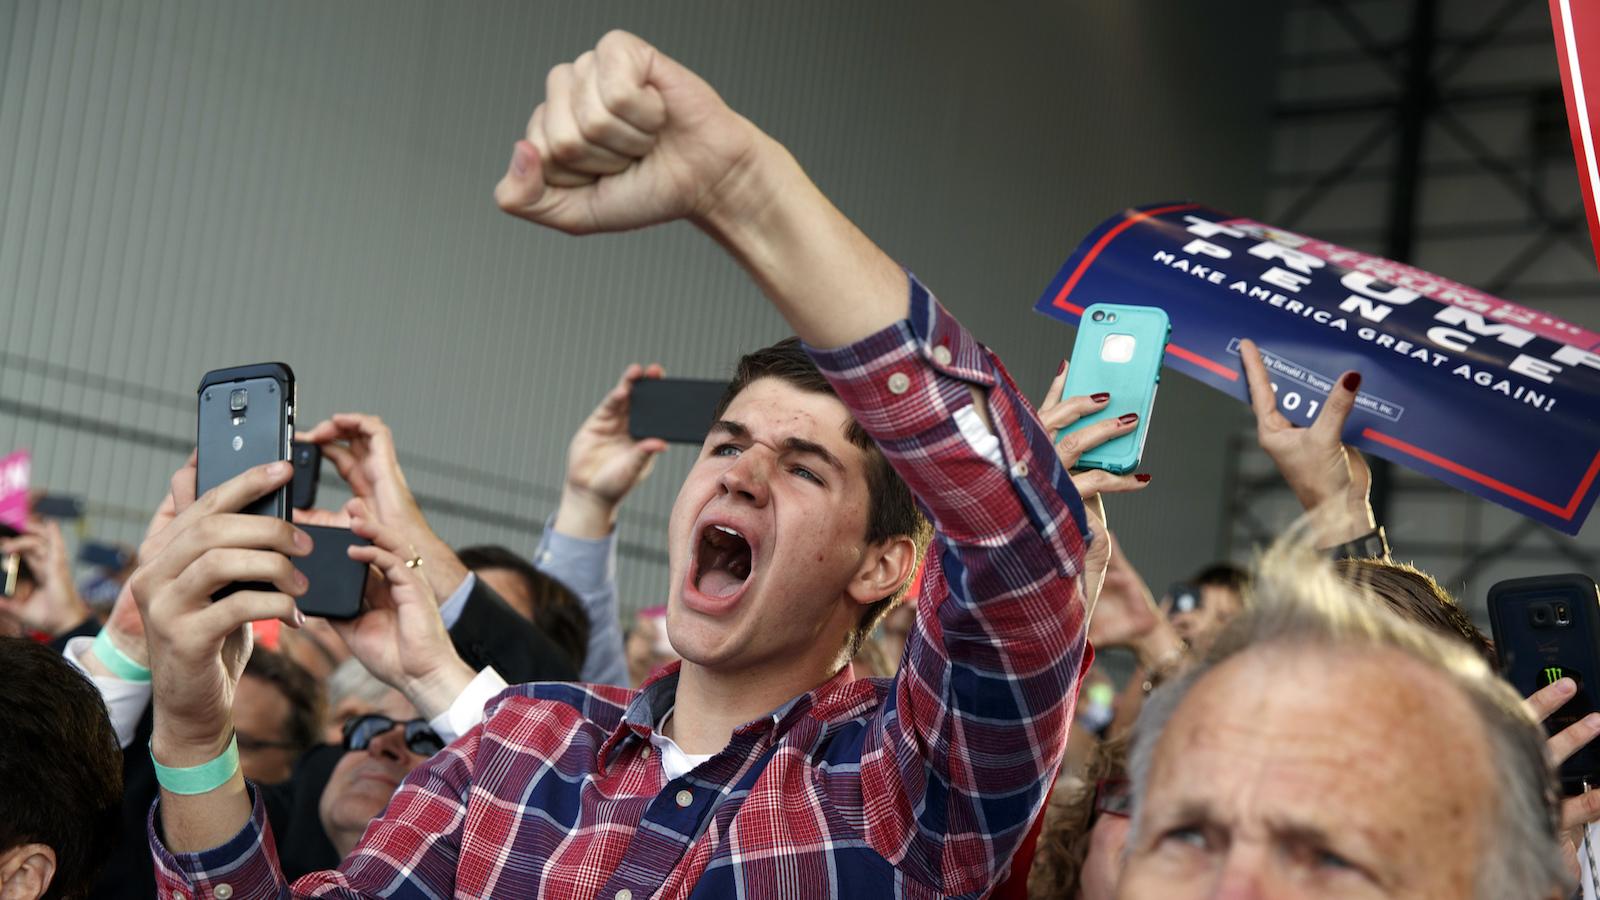 Donald Trump supporter cheers